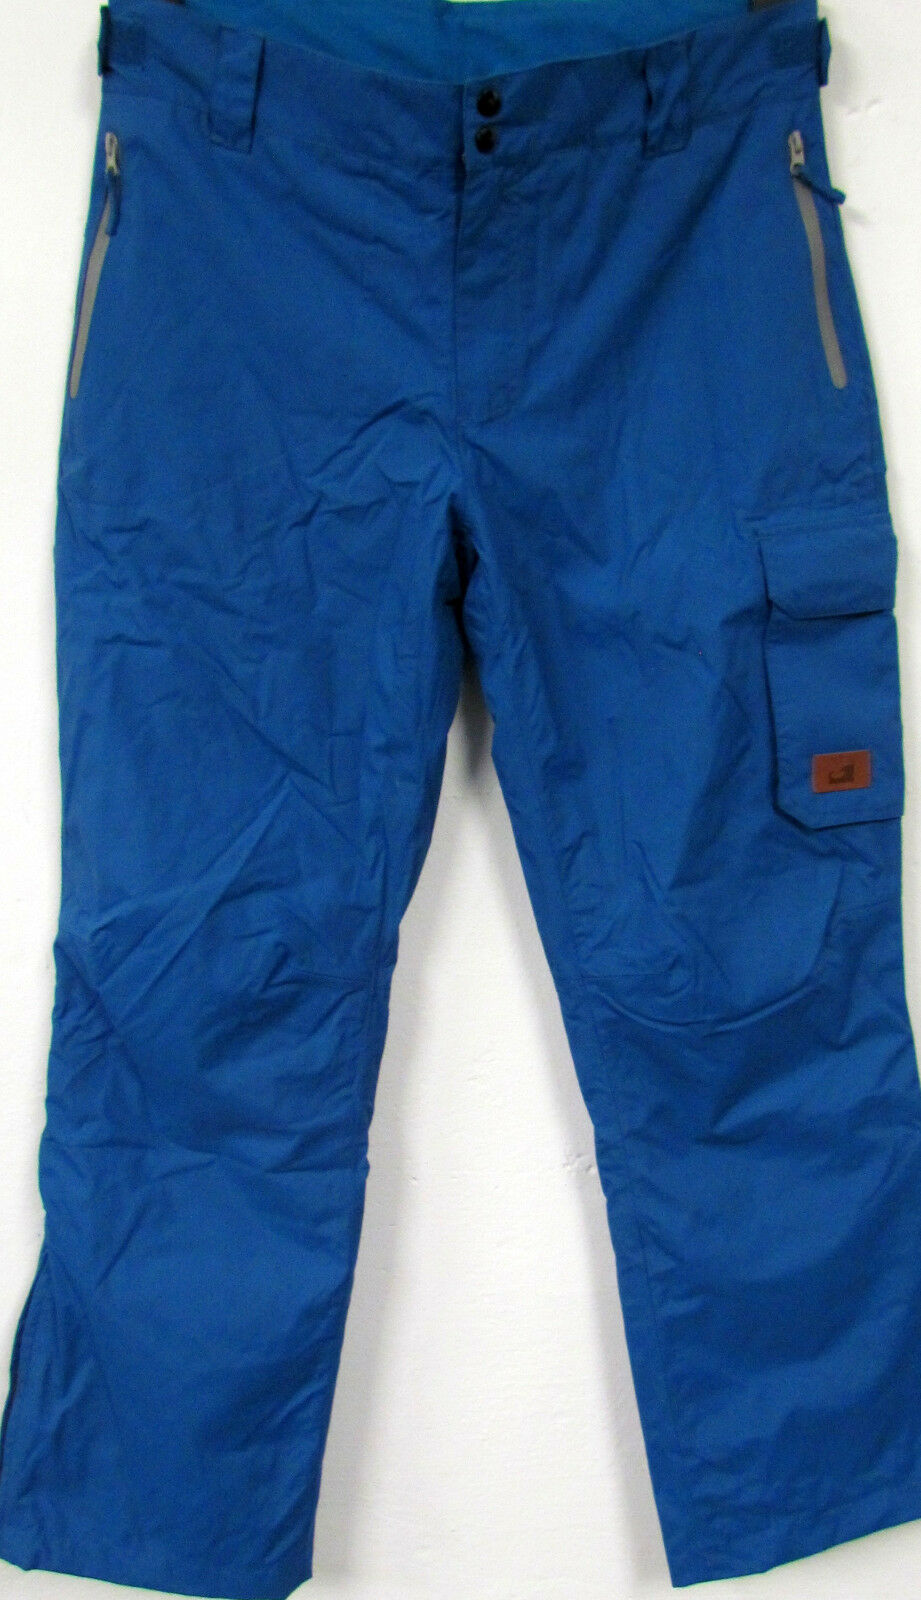 Neu Herren Outdoor Snowboardhose Ski Hose petrol blau große Größe L  XL  50  52